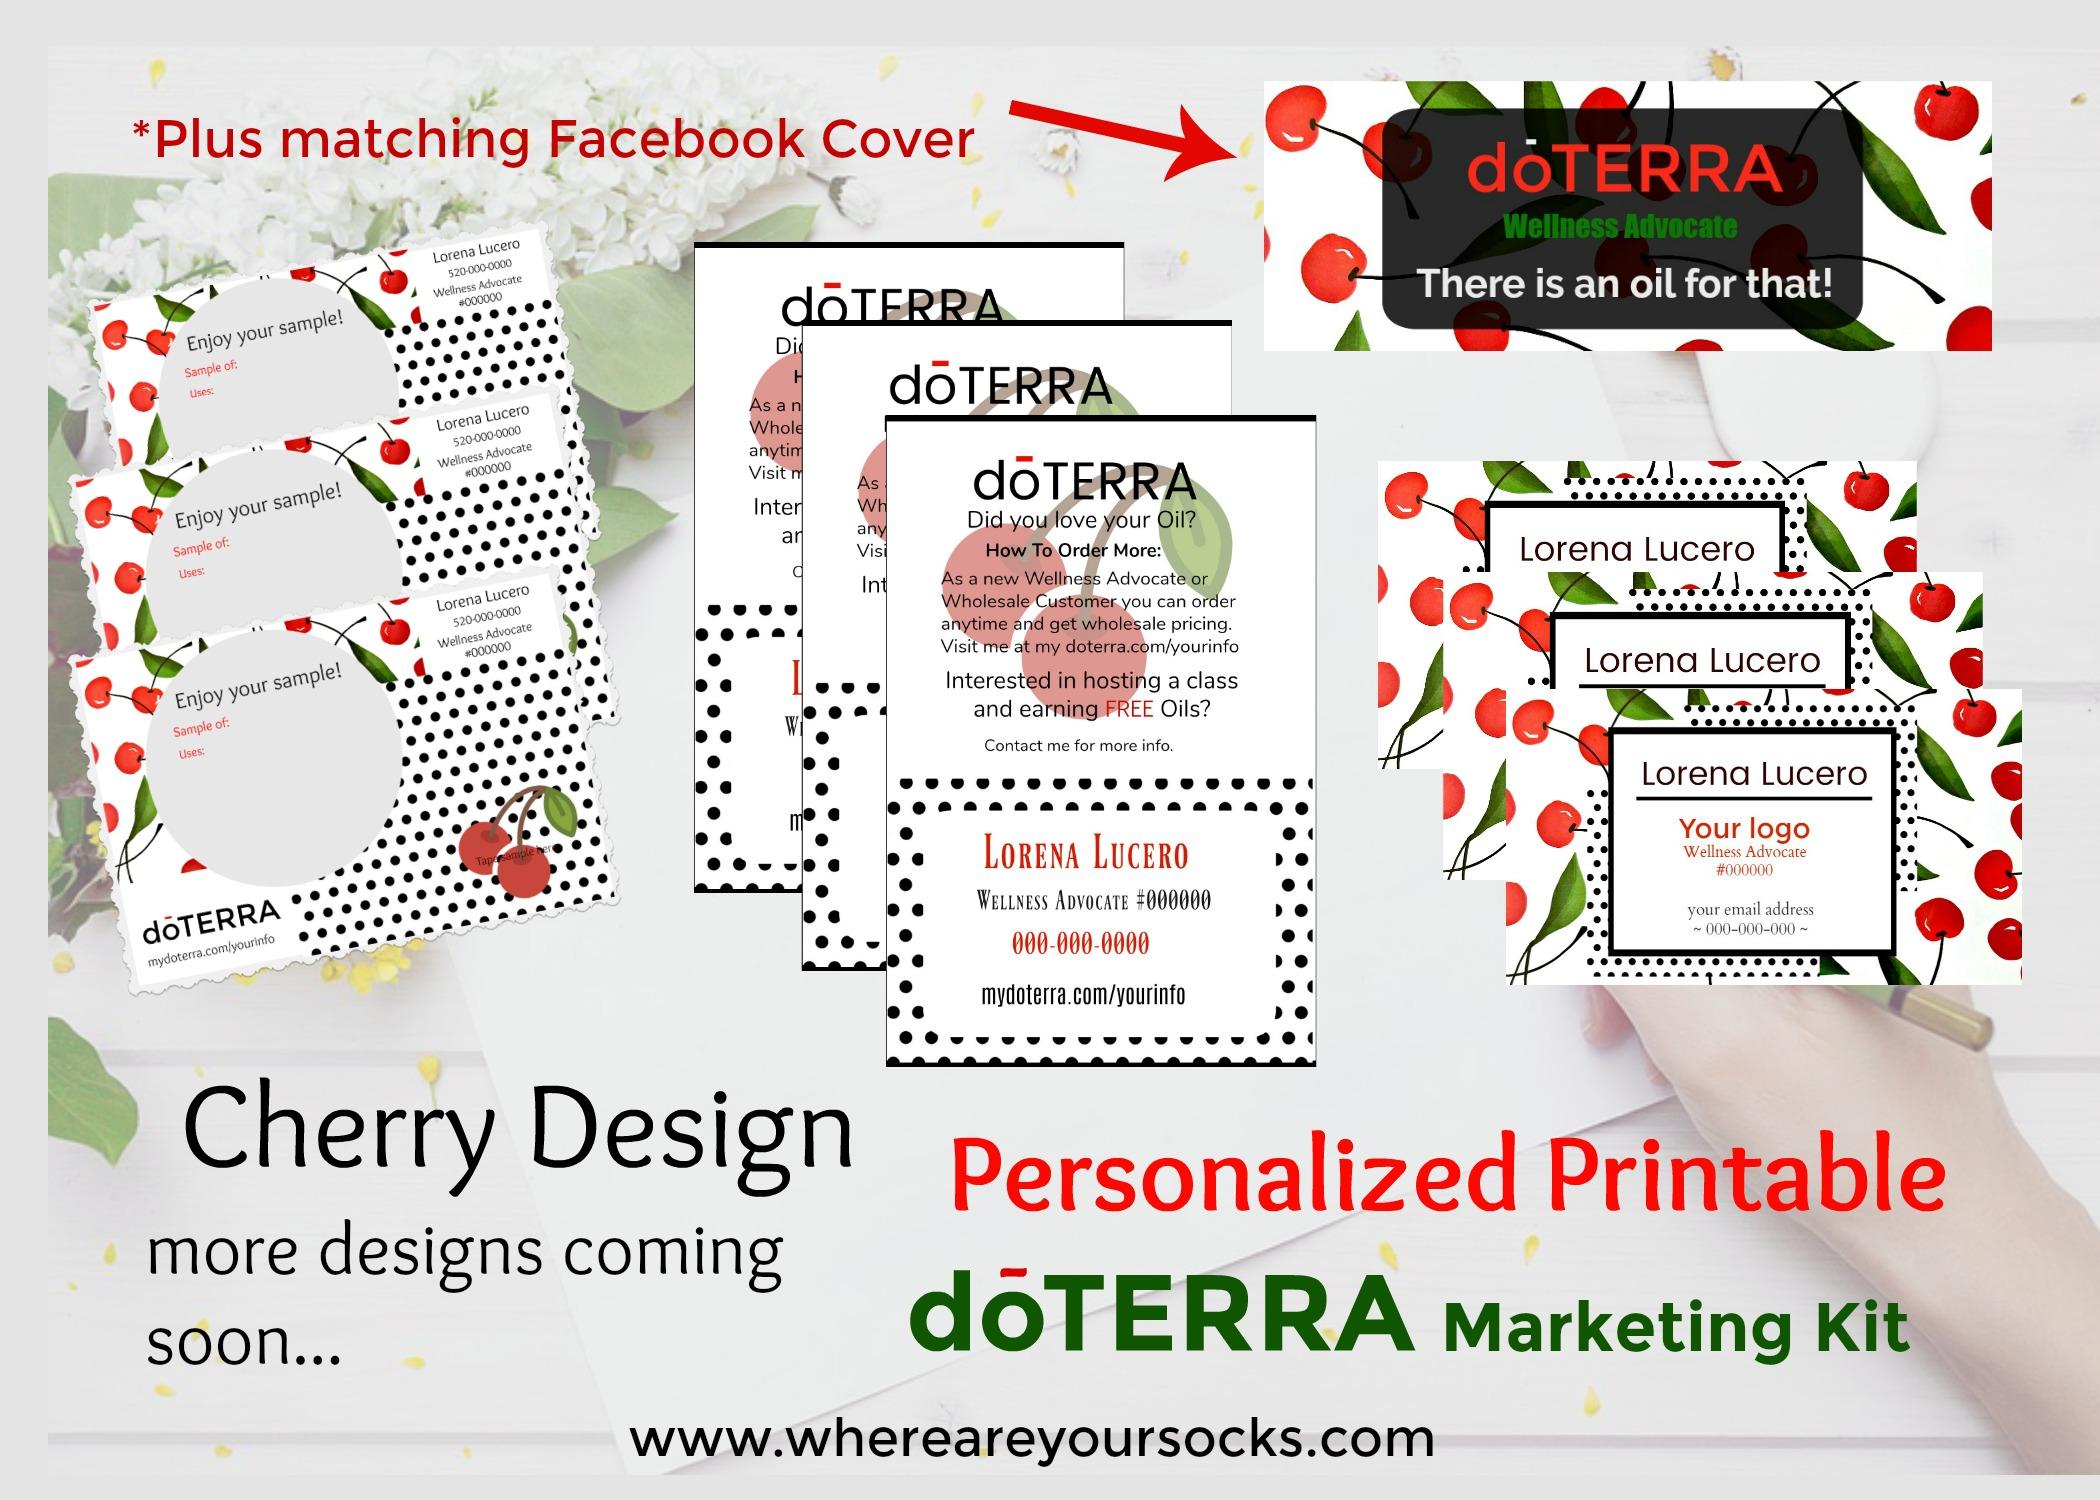 cherries personalized printable marketing kit